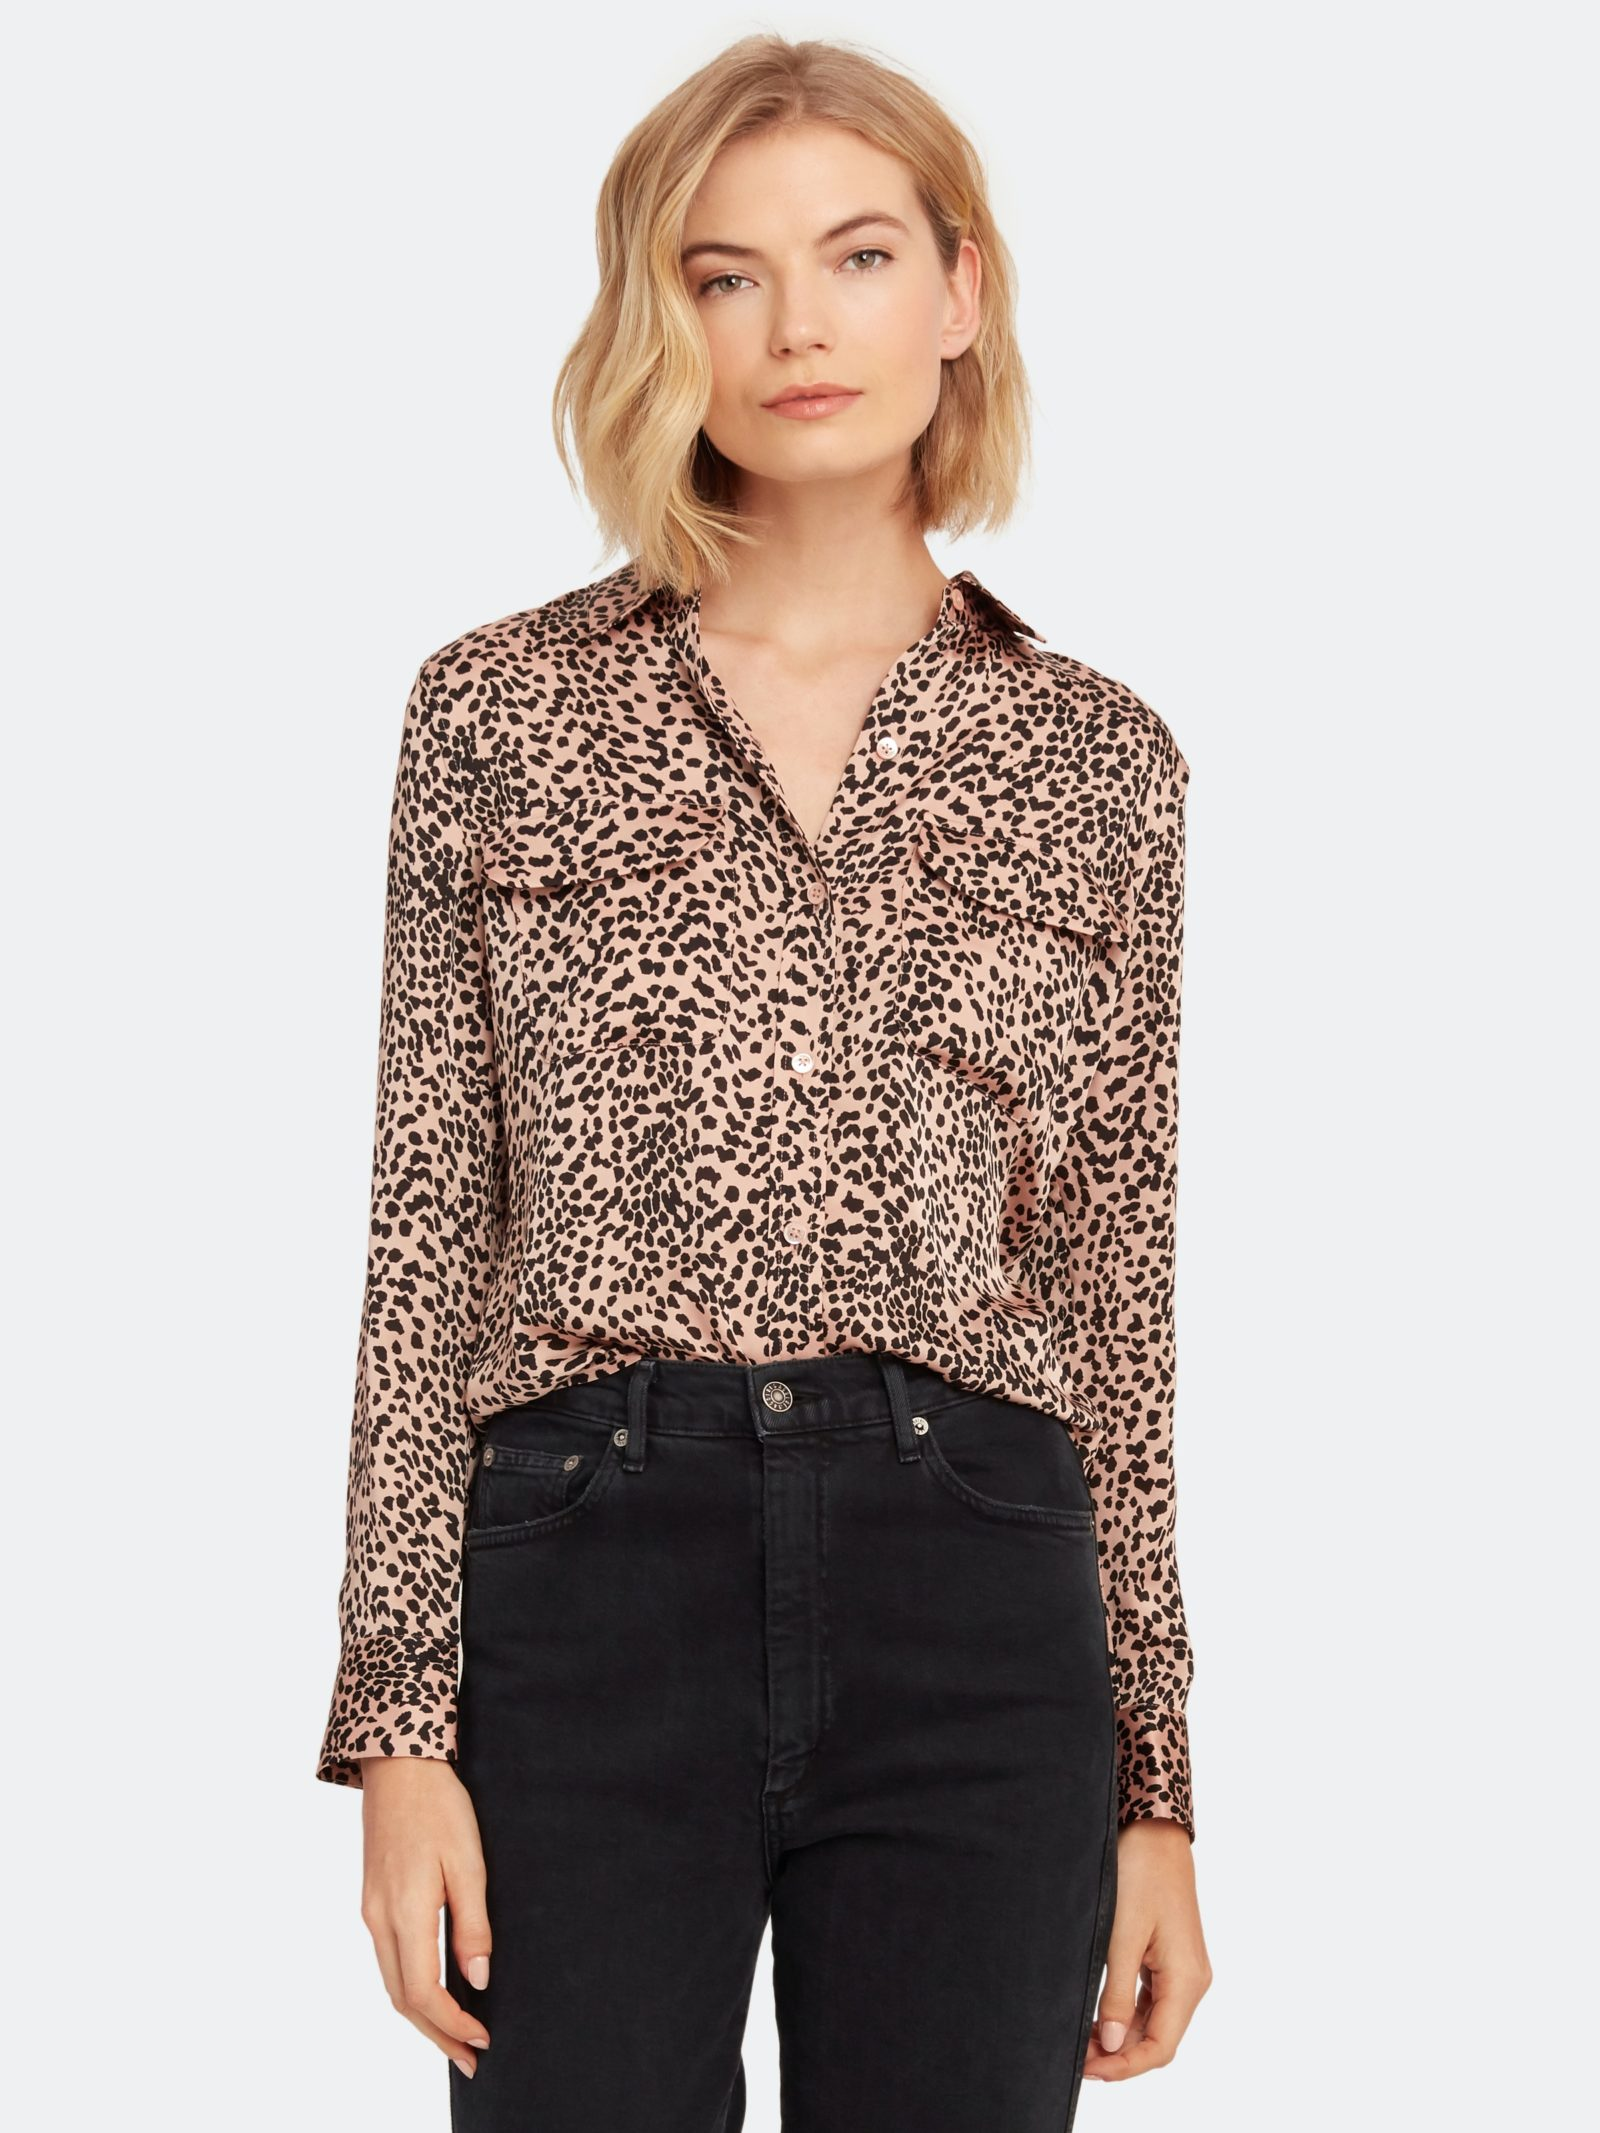 Verishop's Up To 80% Off Sale shirt